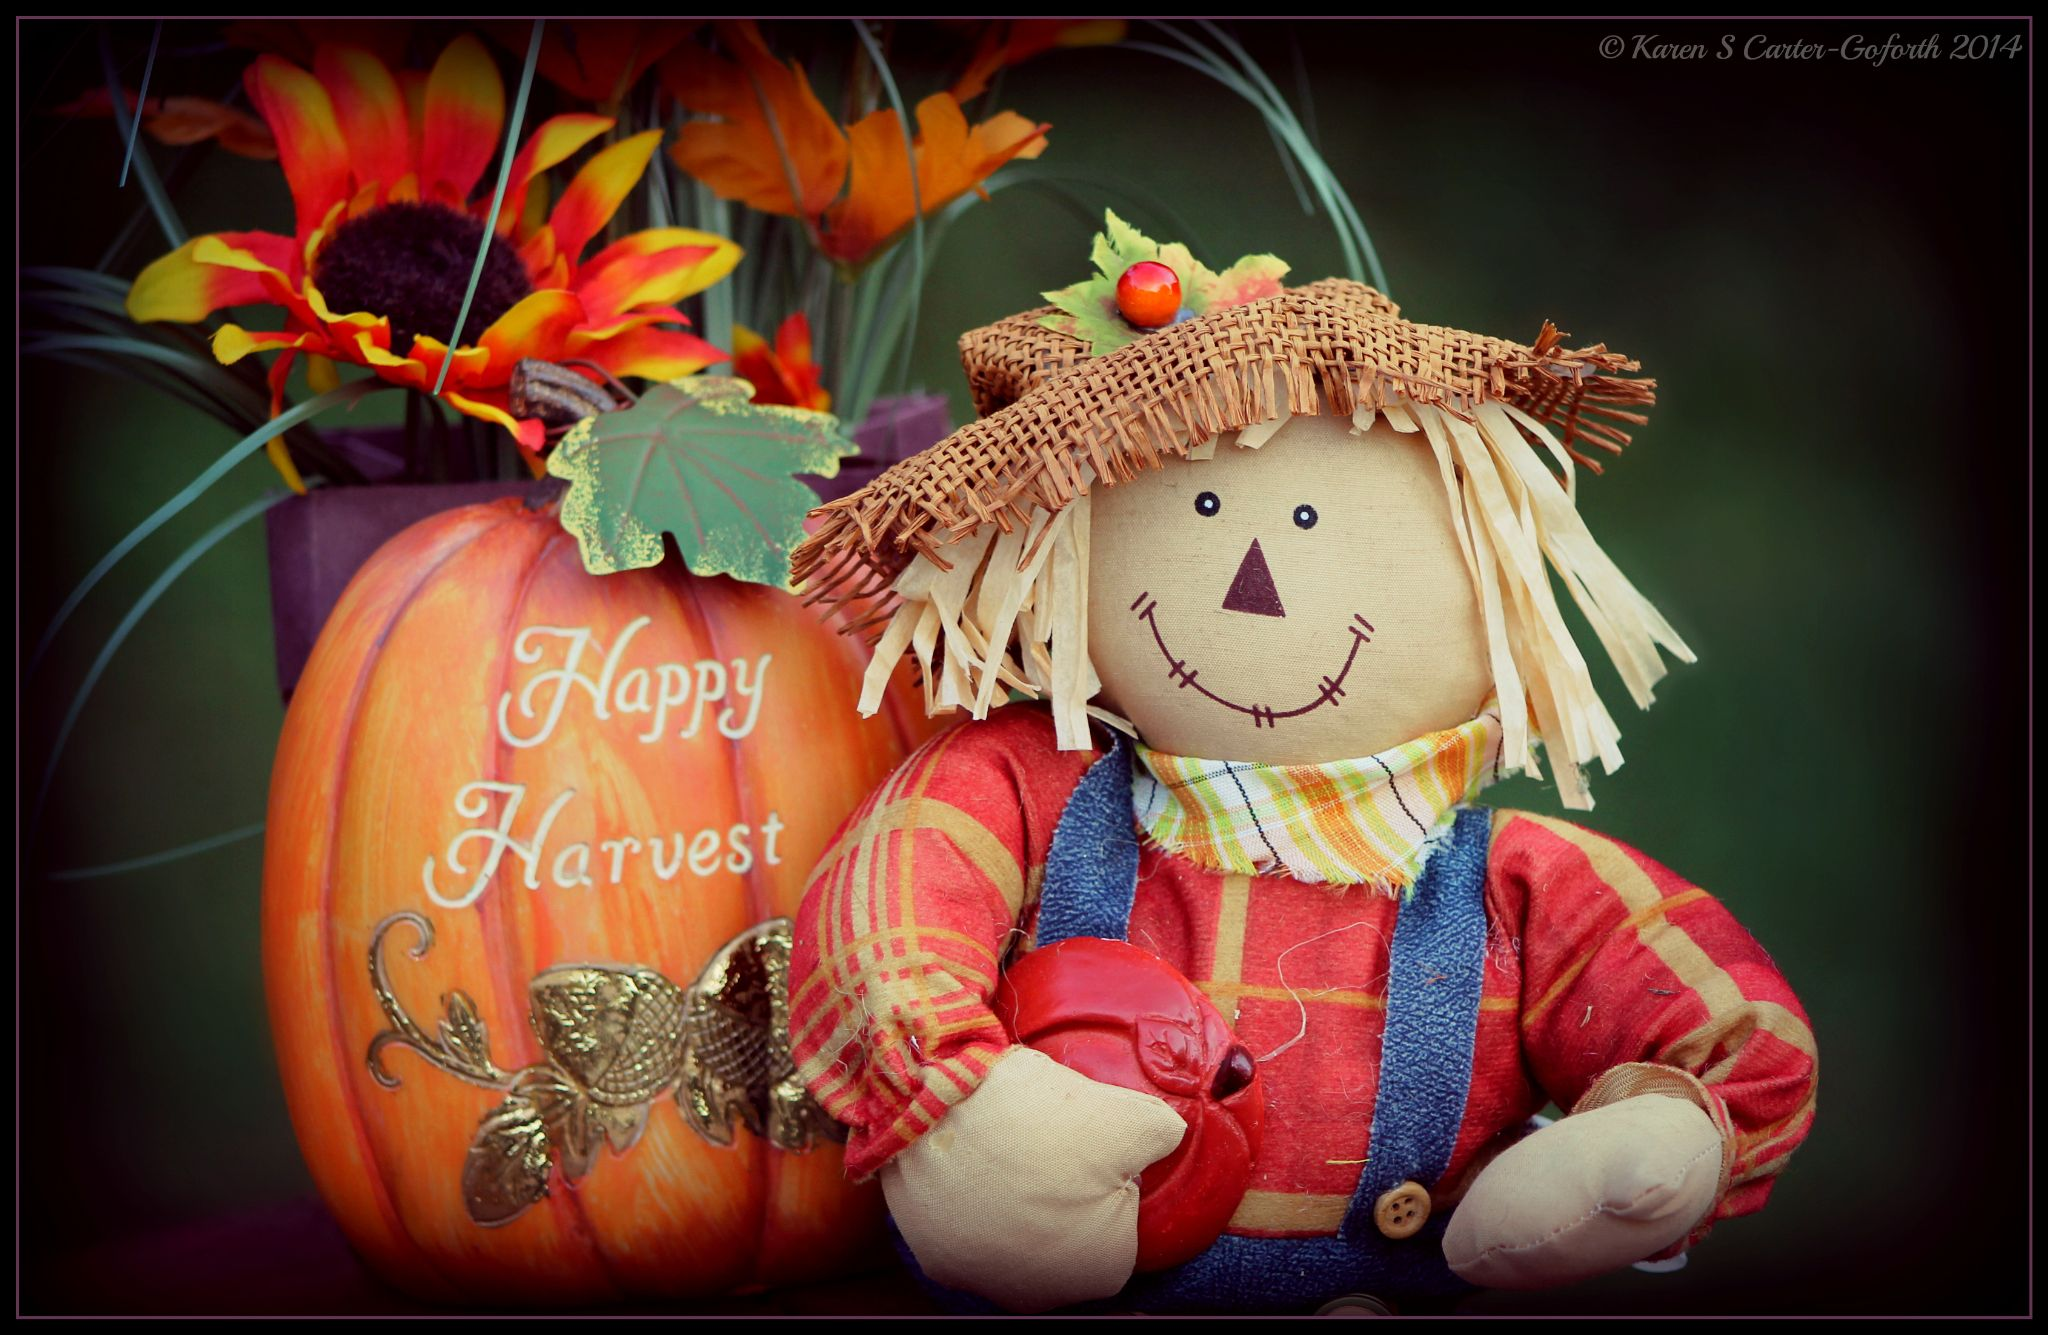 Happy Harvest 1  by Karen Carter-Goforth